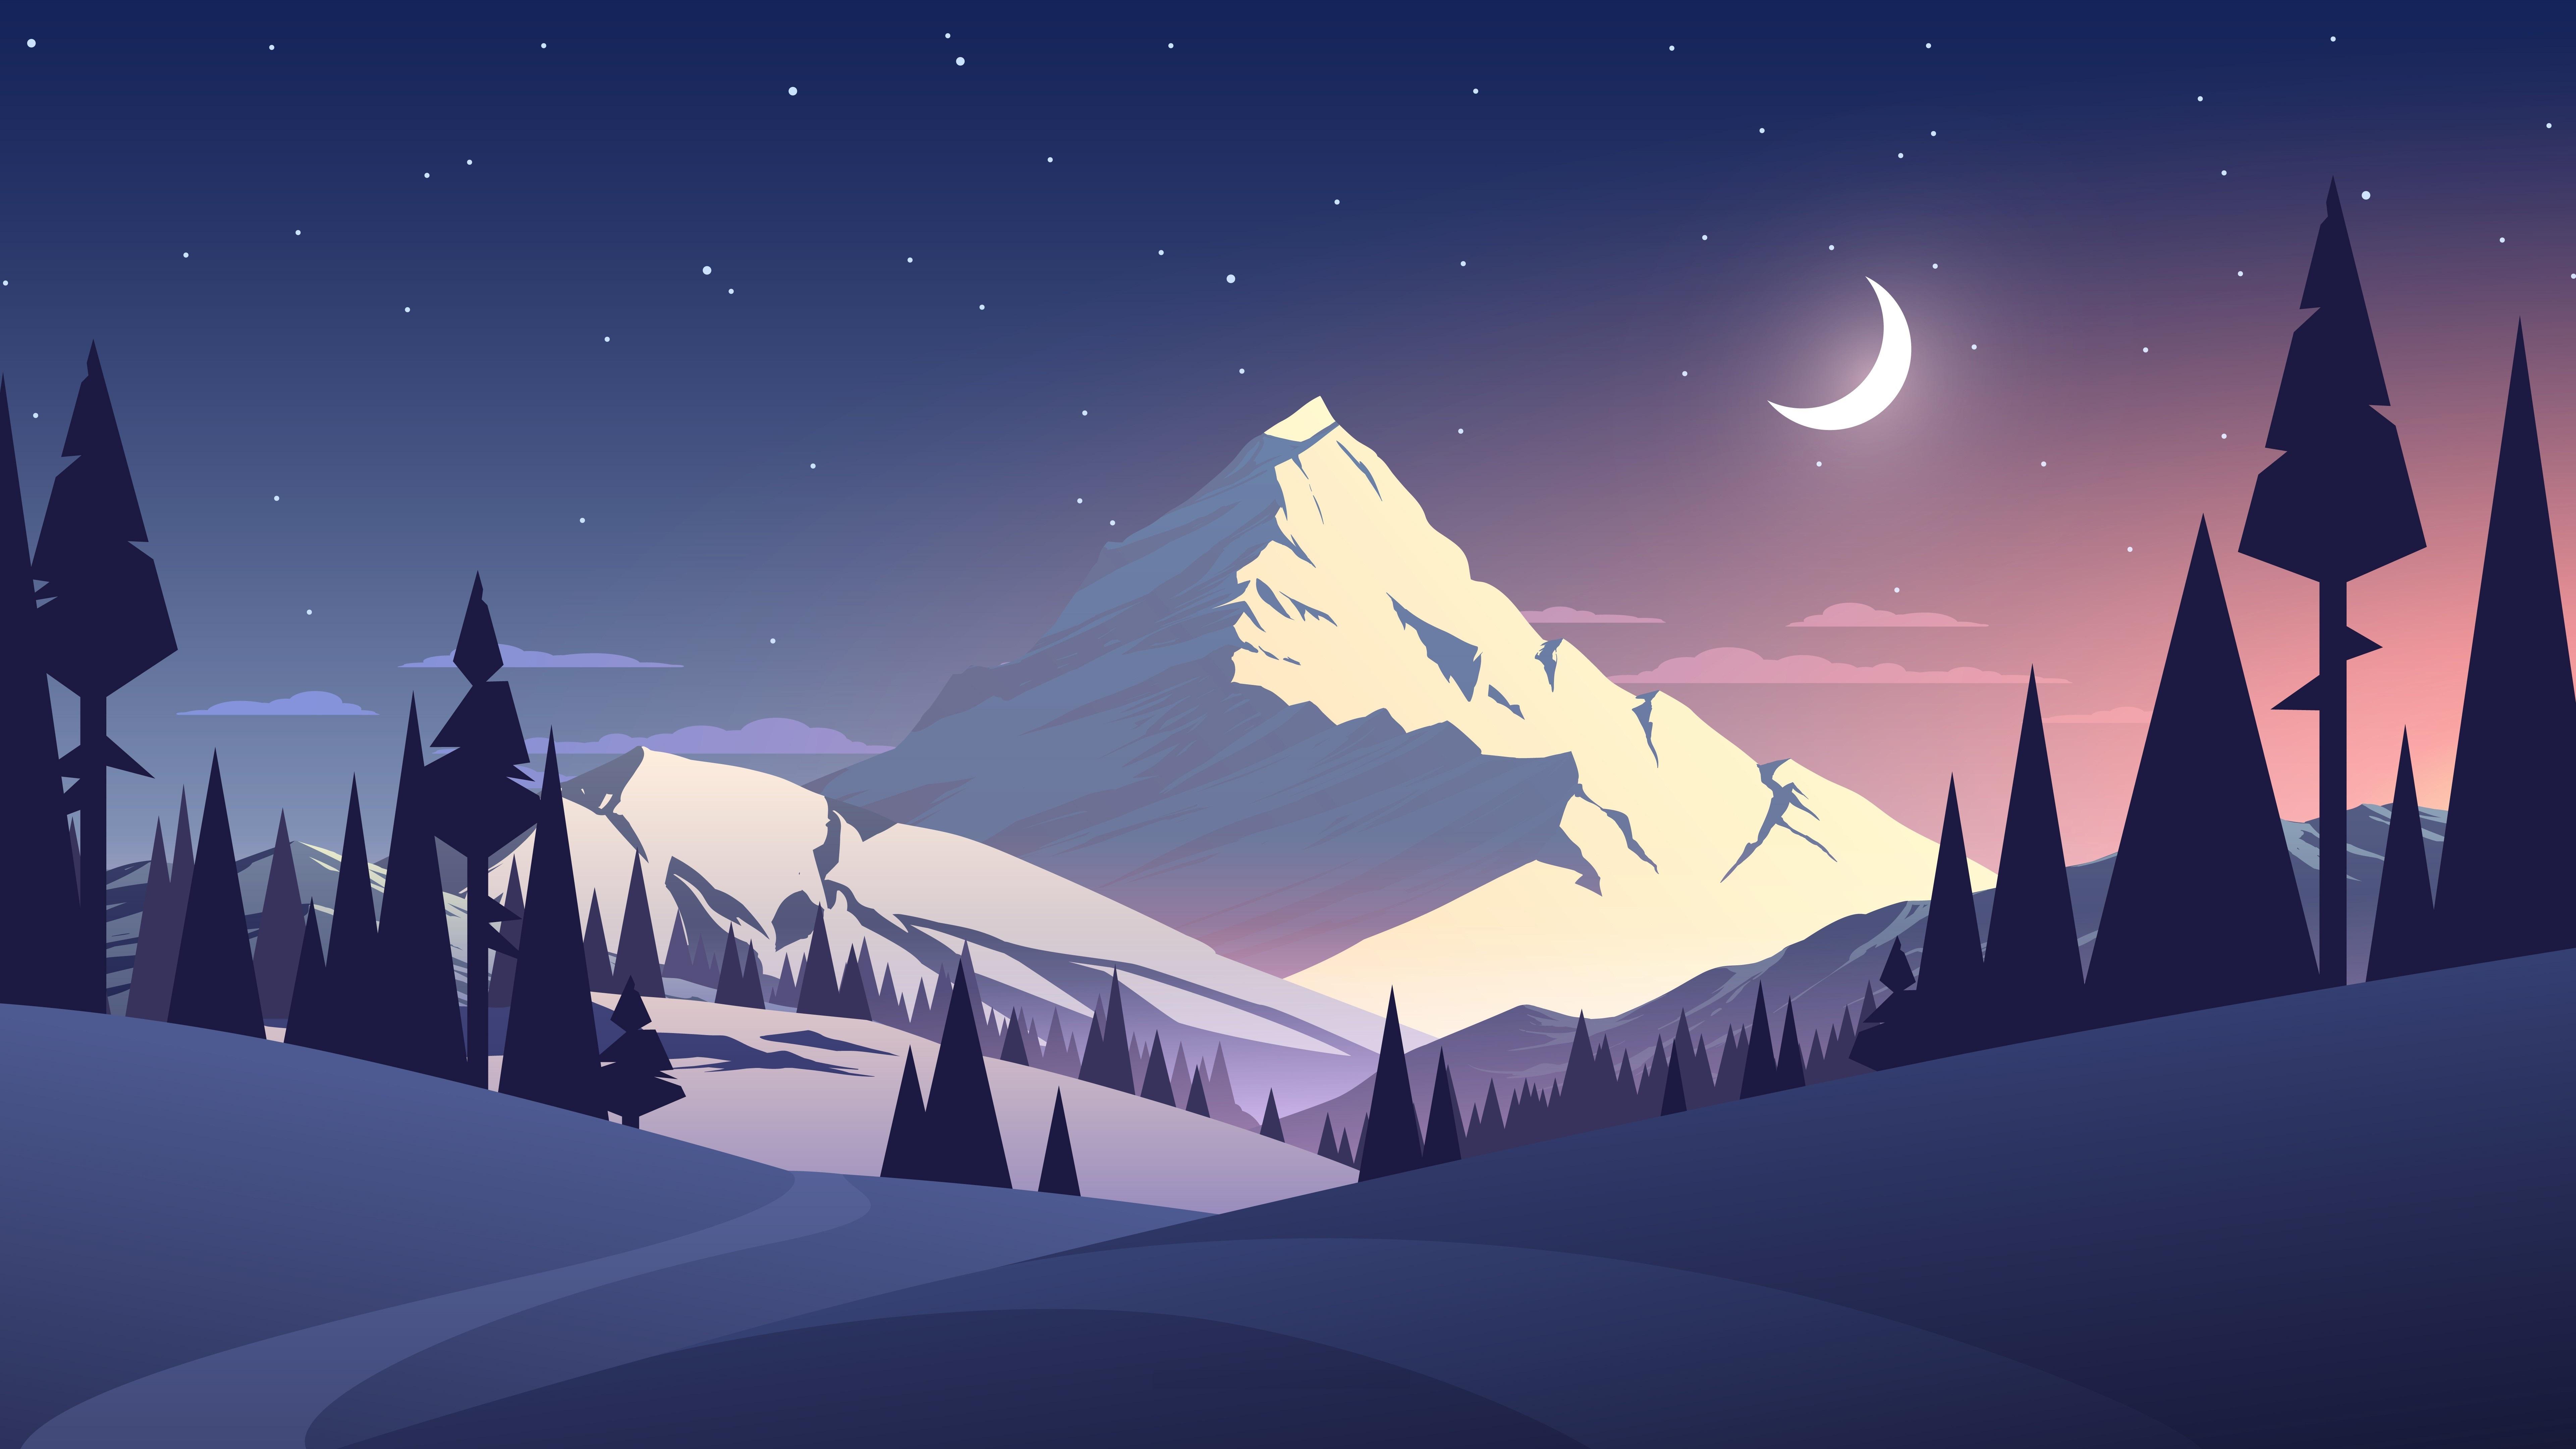 Winter landscape minimalist digital art wallpaper